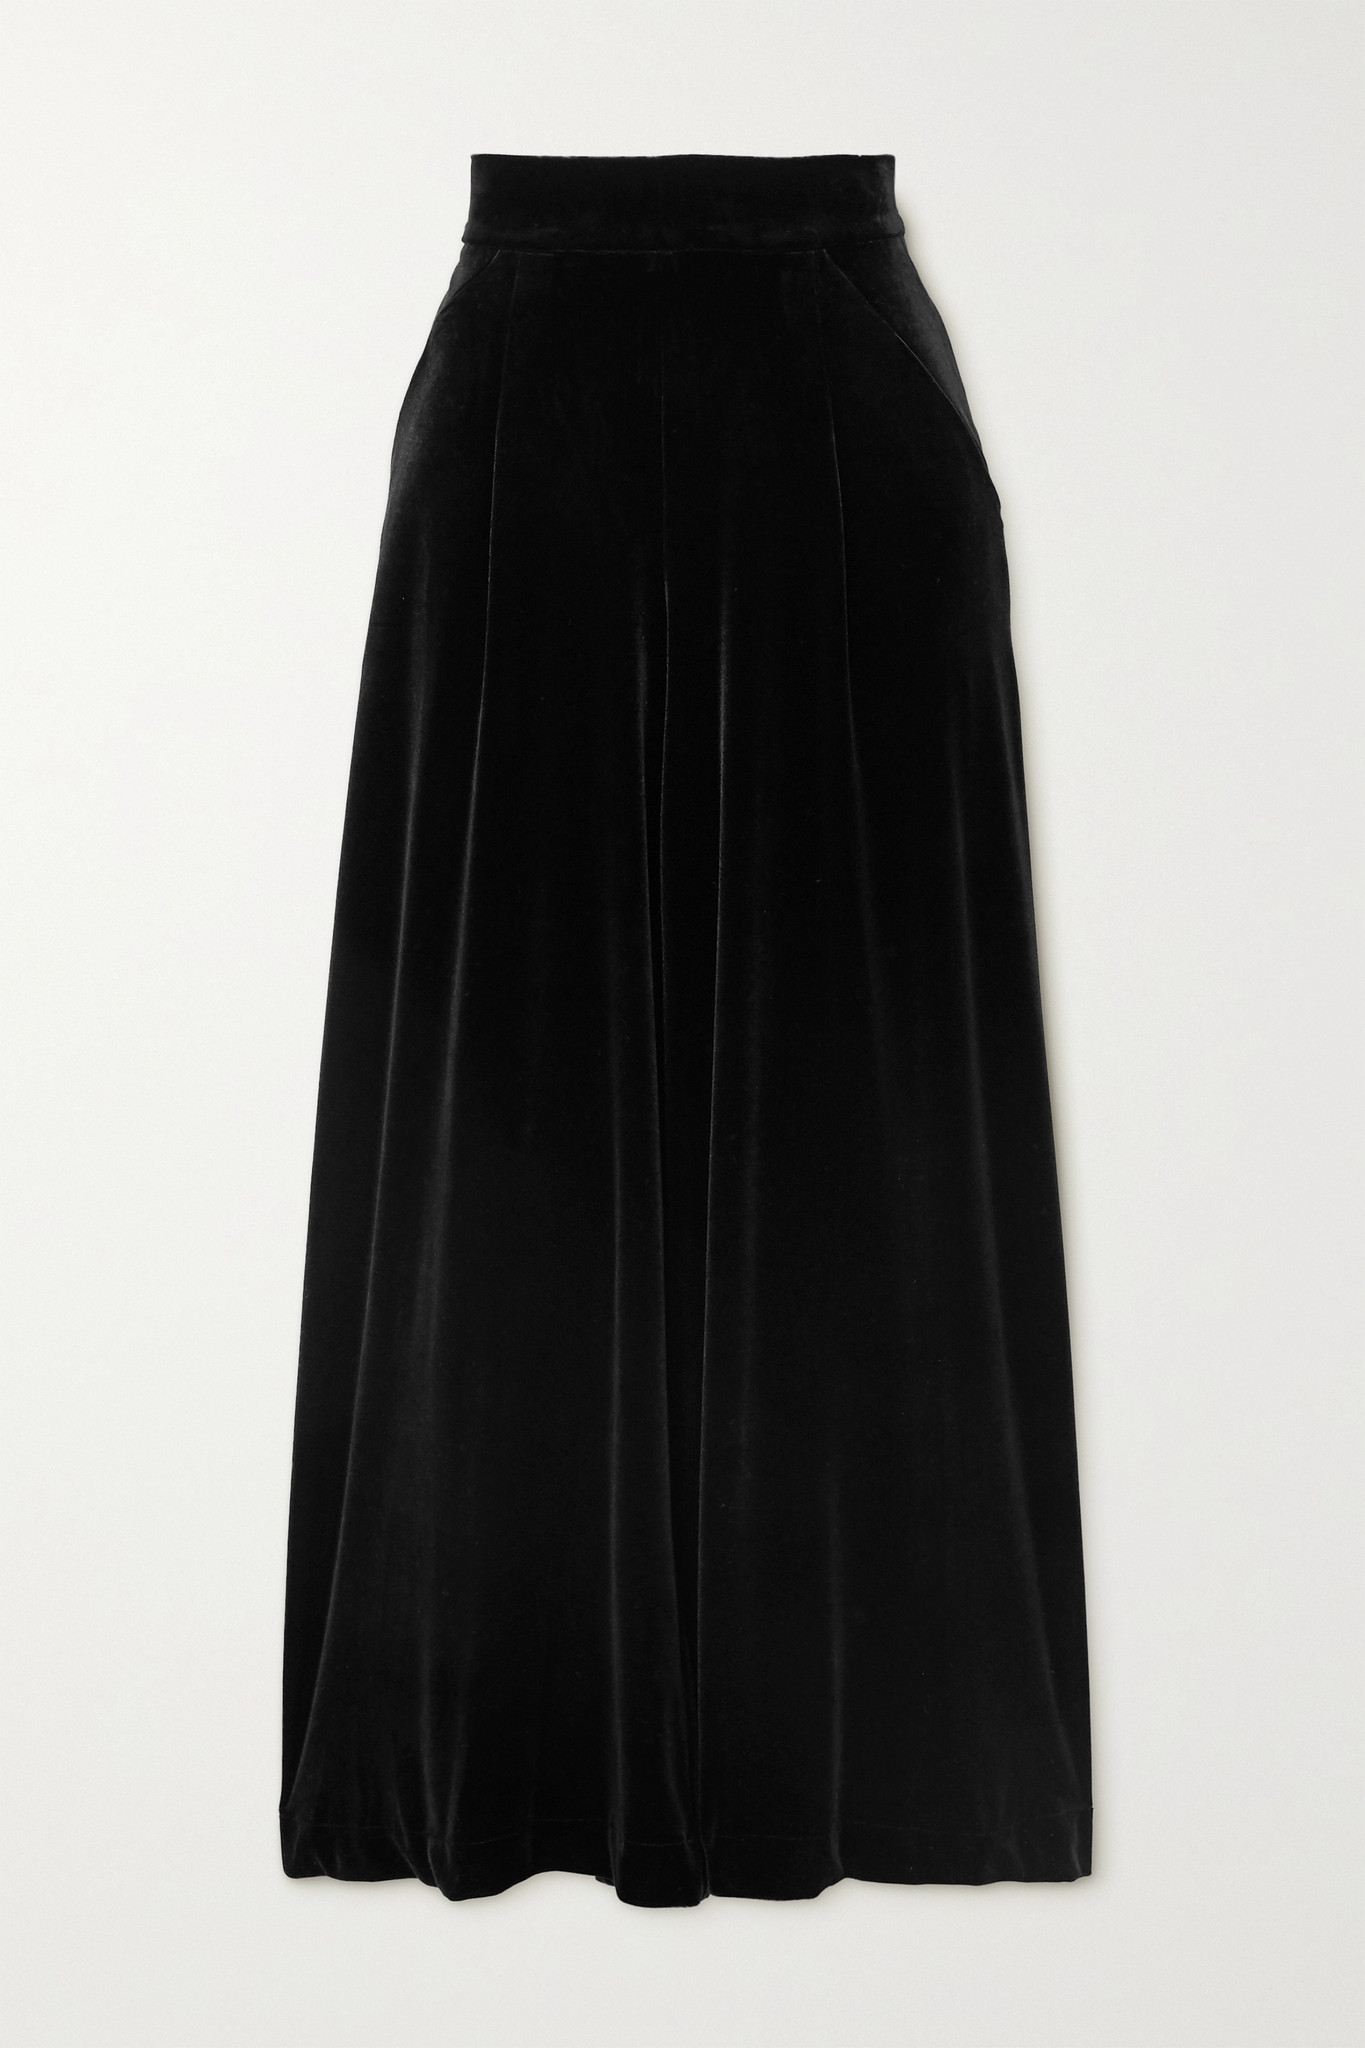 LORETTA CAPONI - Sabrina Stretch-velvet Wide-leg Pants - Black - x small